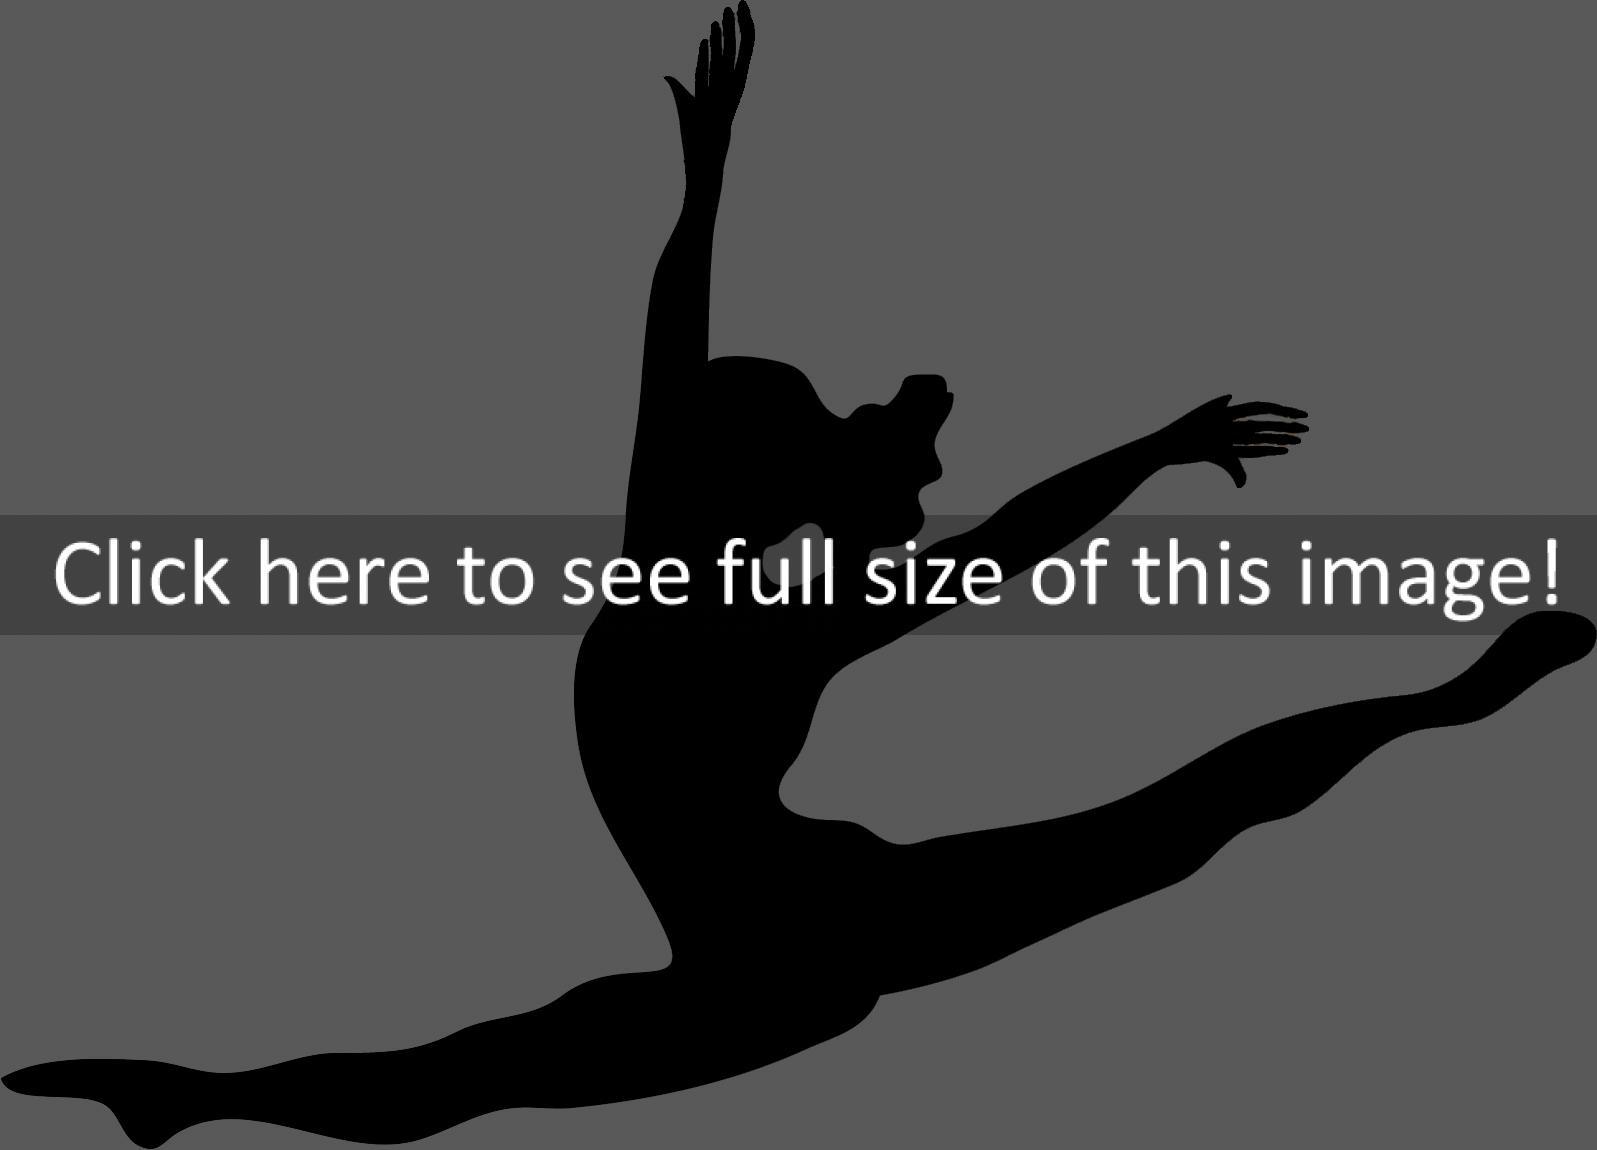 Jazz Dancer Silhouette Png   1597x1150 Wallpaper   teahubio 1597x1150